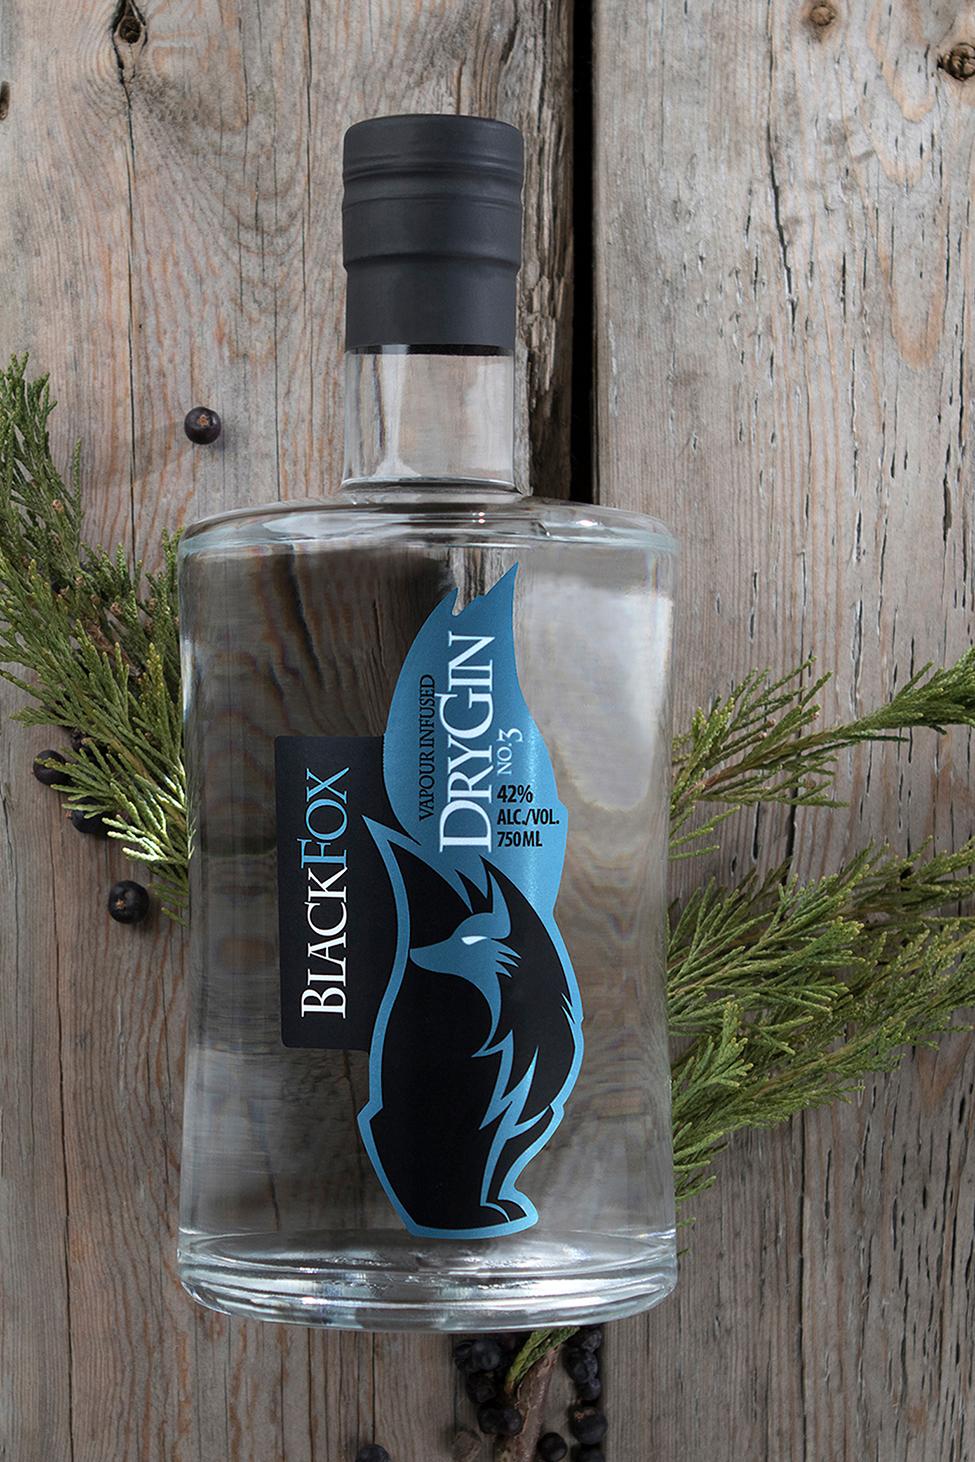 Black Fox Gin - Hand Crafted & Single Batch